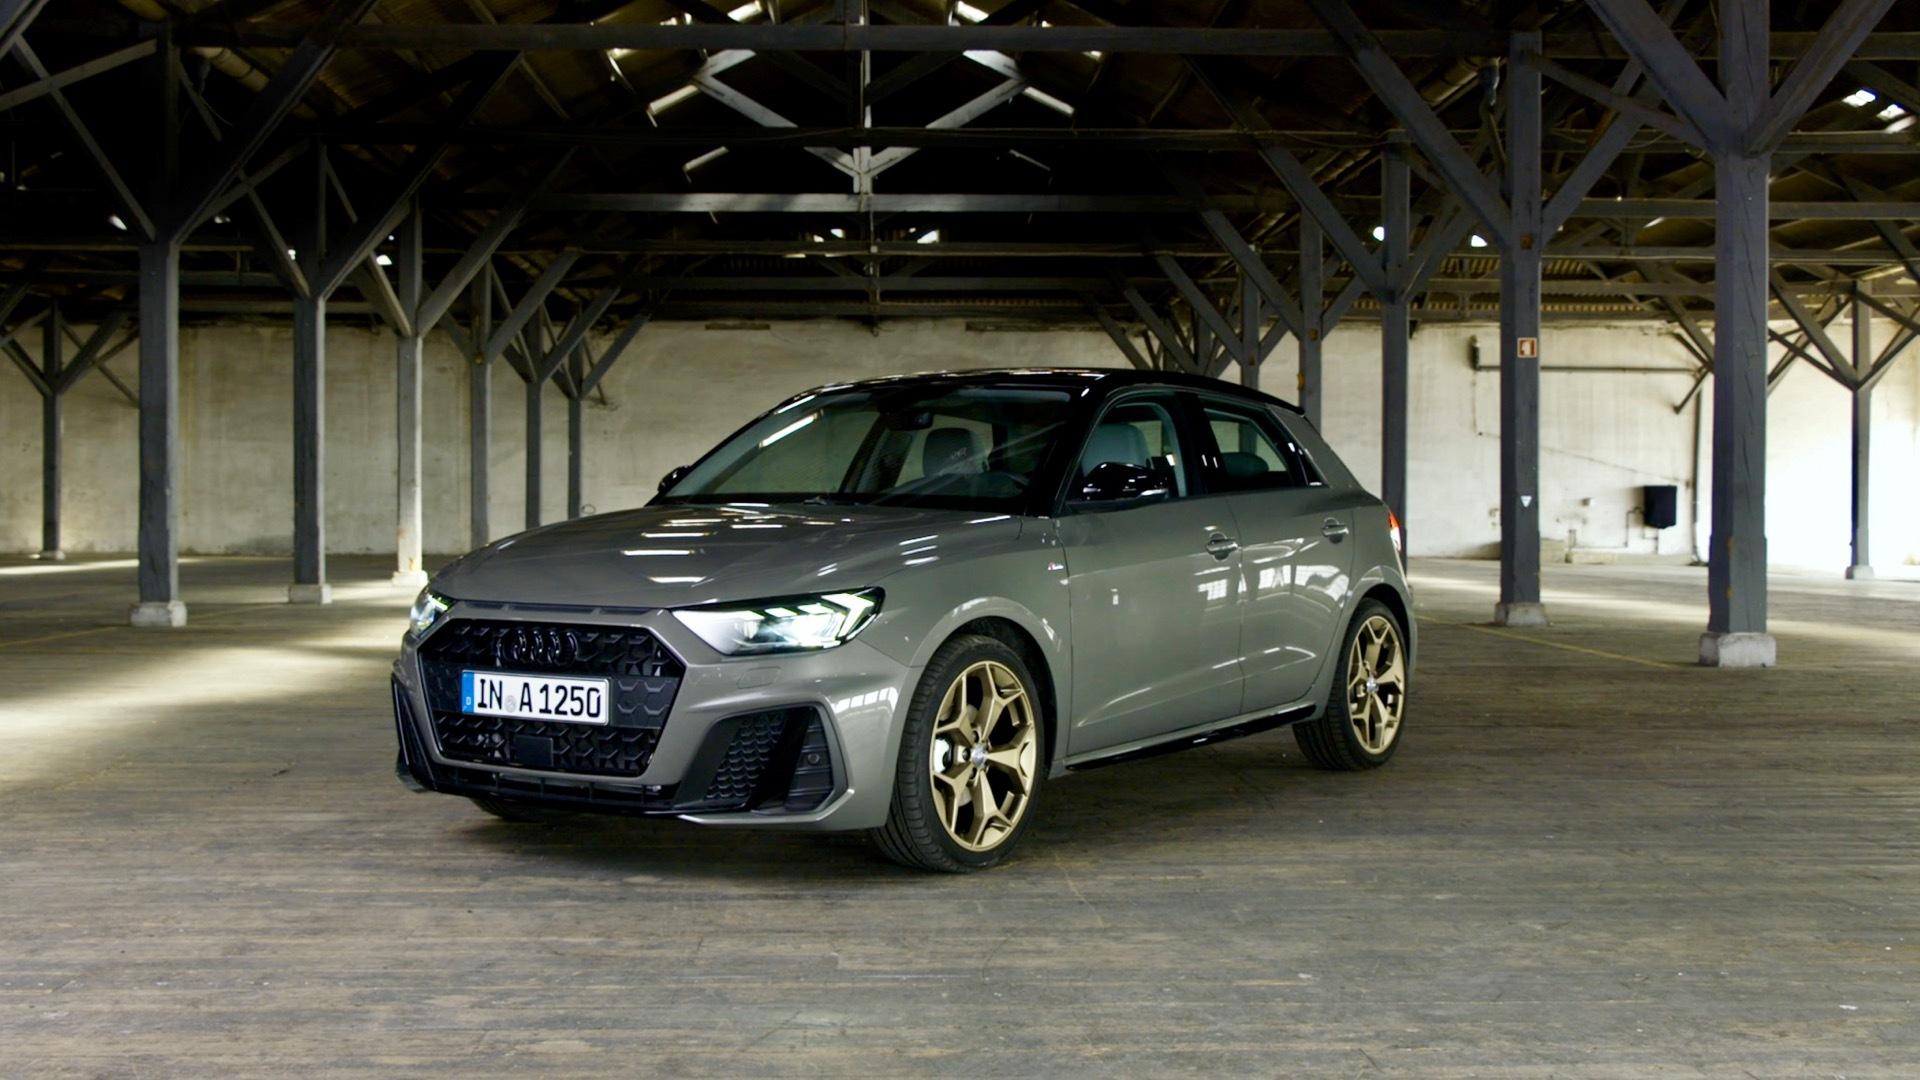 The new Audi A1 Sportback